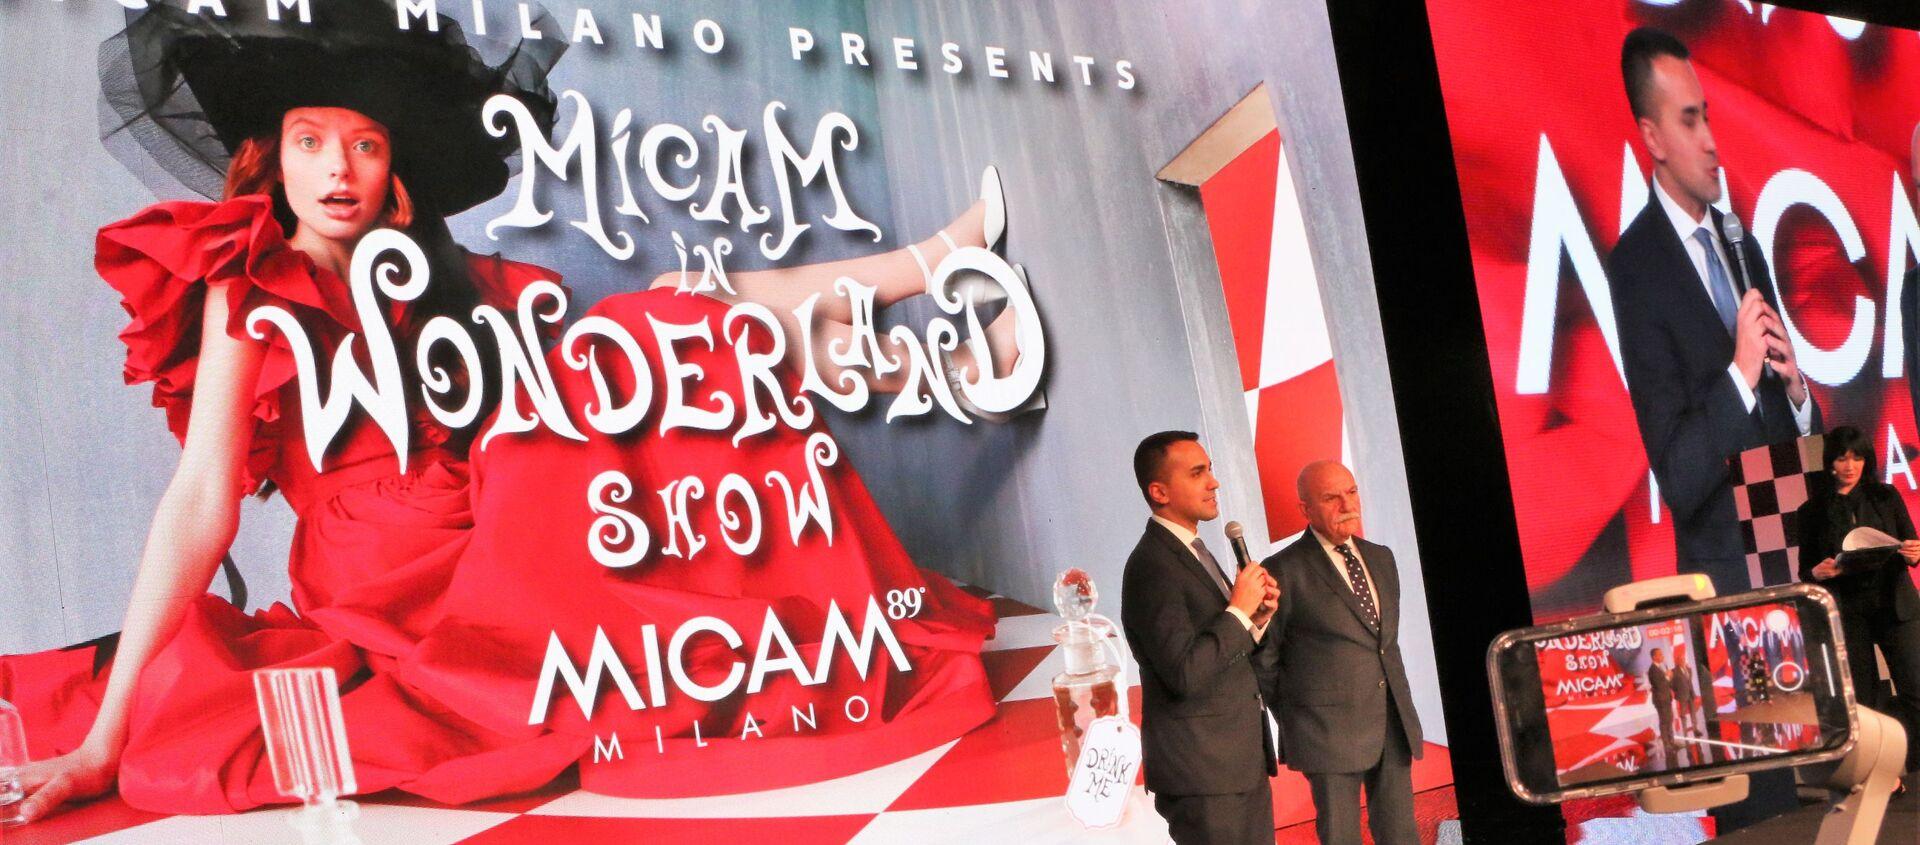 Show MICAM in Wonderland - Sputnik Italia, 1920, 18.02.2020